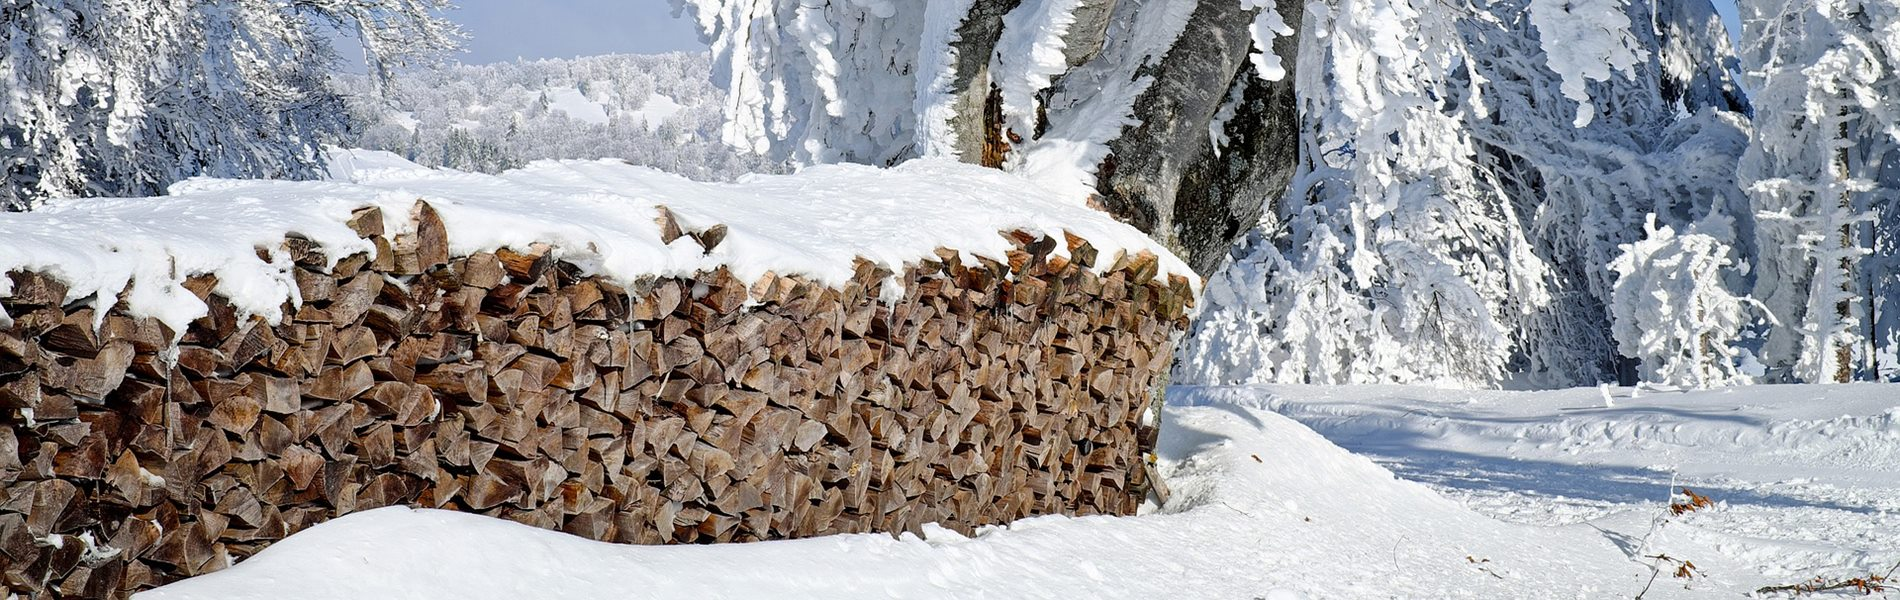 winterland-gaestehaus-josenmuehle